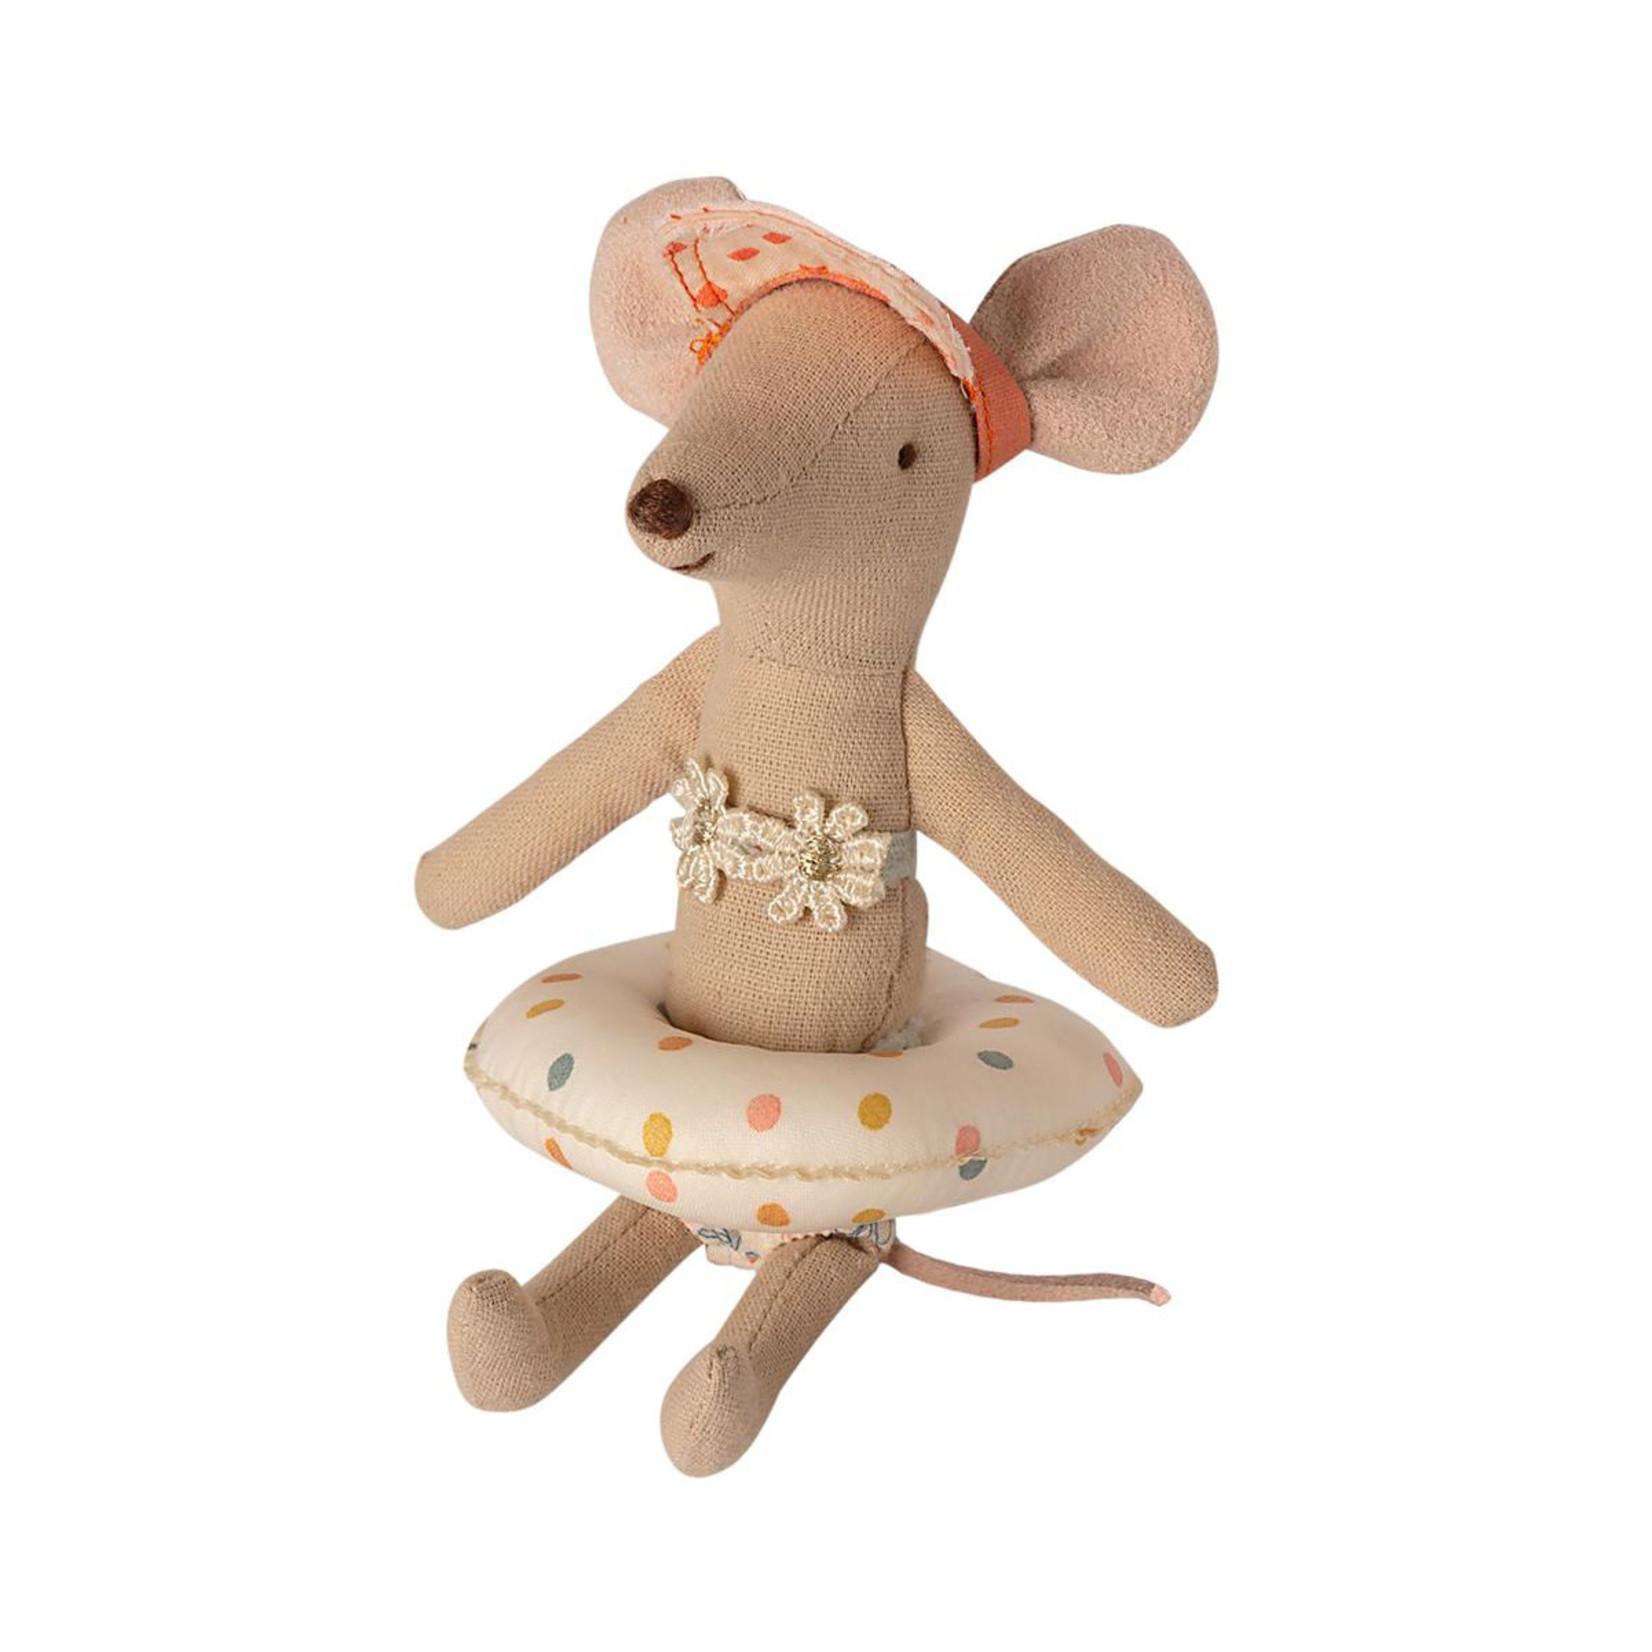 Maileg Maileg Float, Small mouse - Multi dot